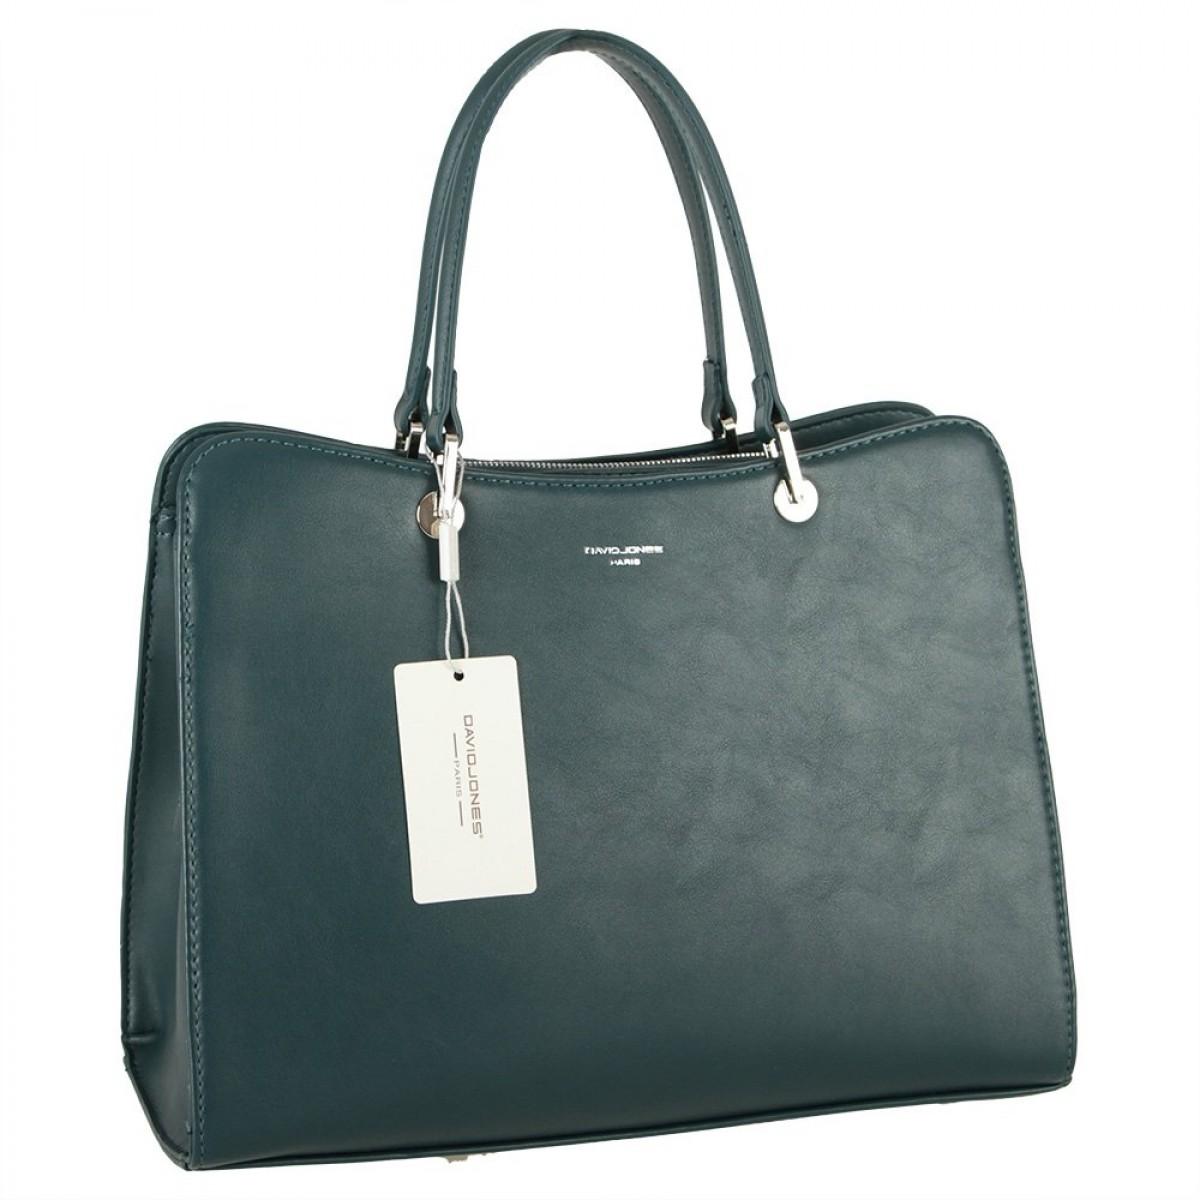 Жіноча сумка David Jones CM5815 PEACOCK BLUE